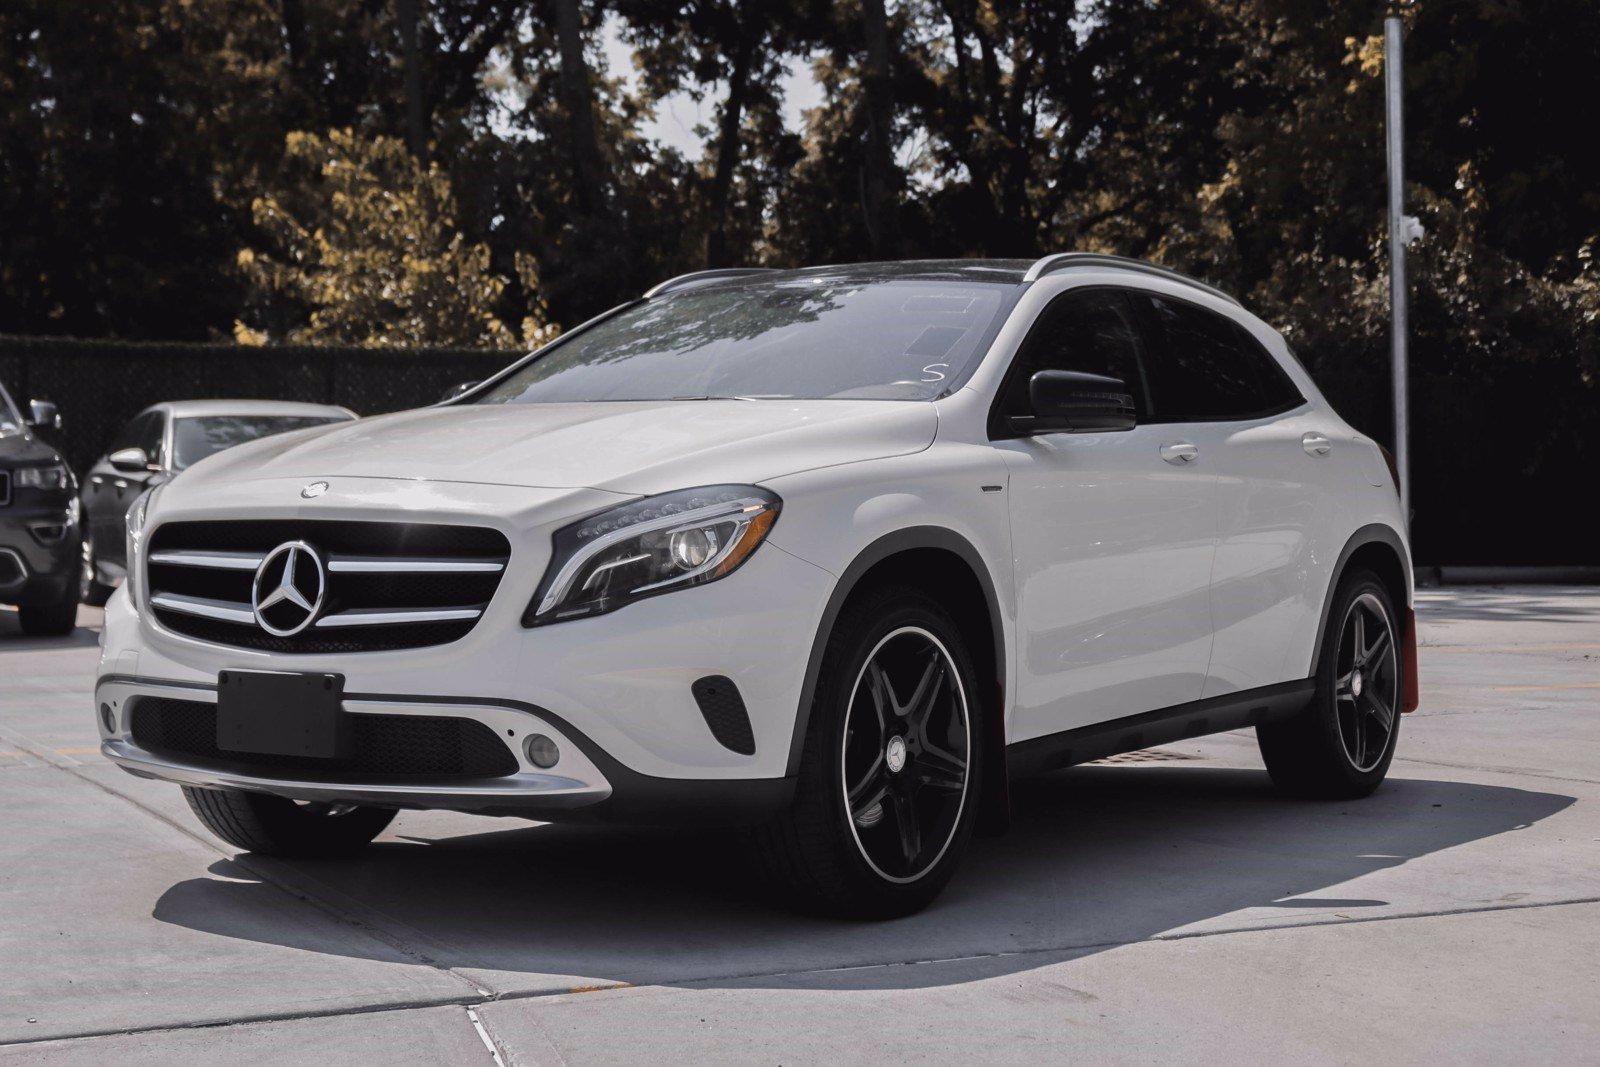 Used-2015-Mercedes-Benz-GLA-250-4MATIC